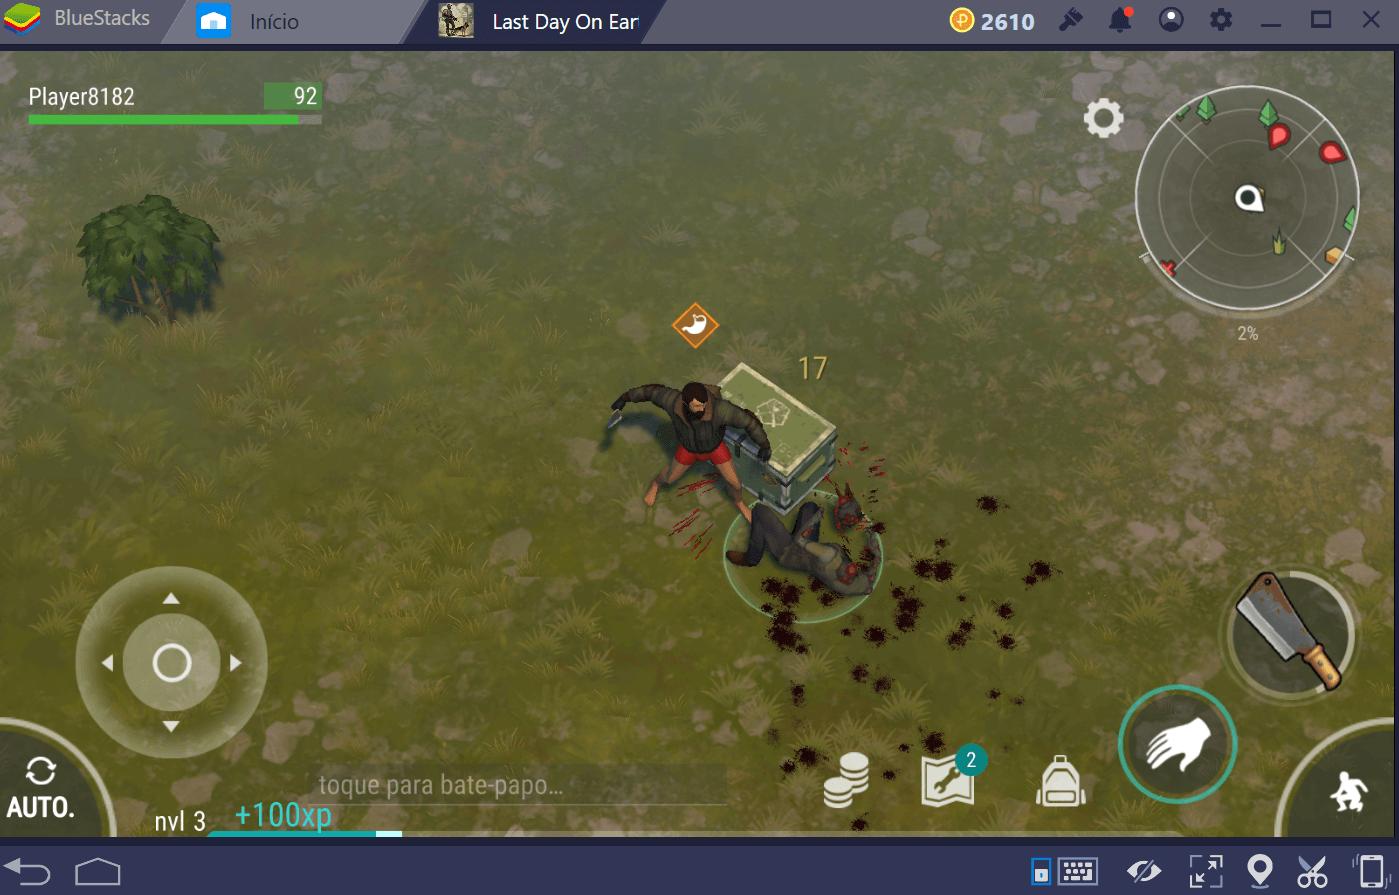 Guia de combate em Last Day on Earth Survival